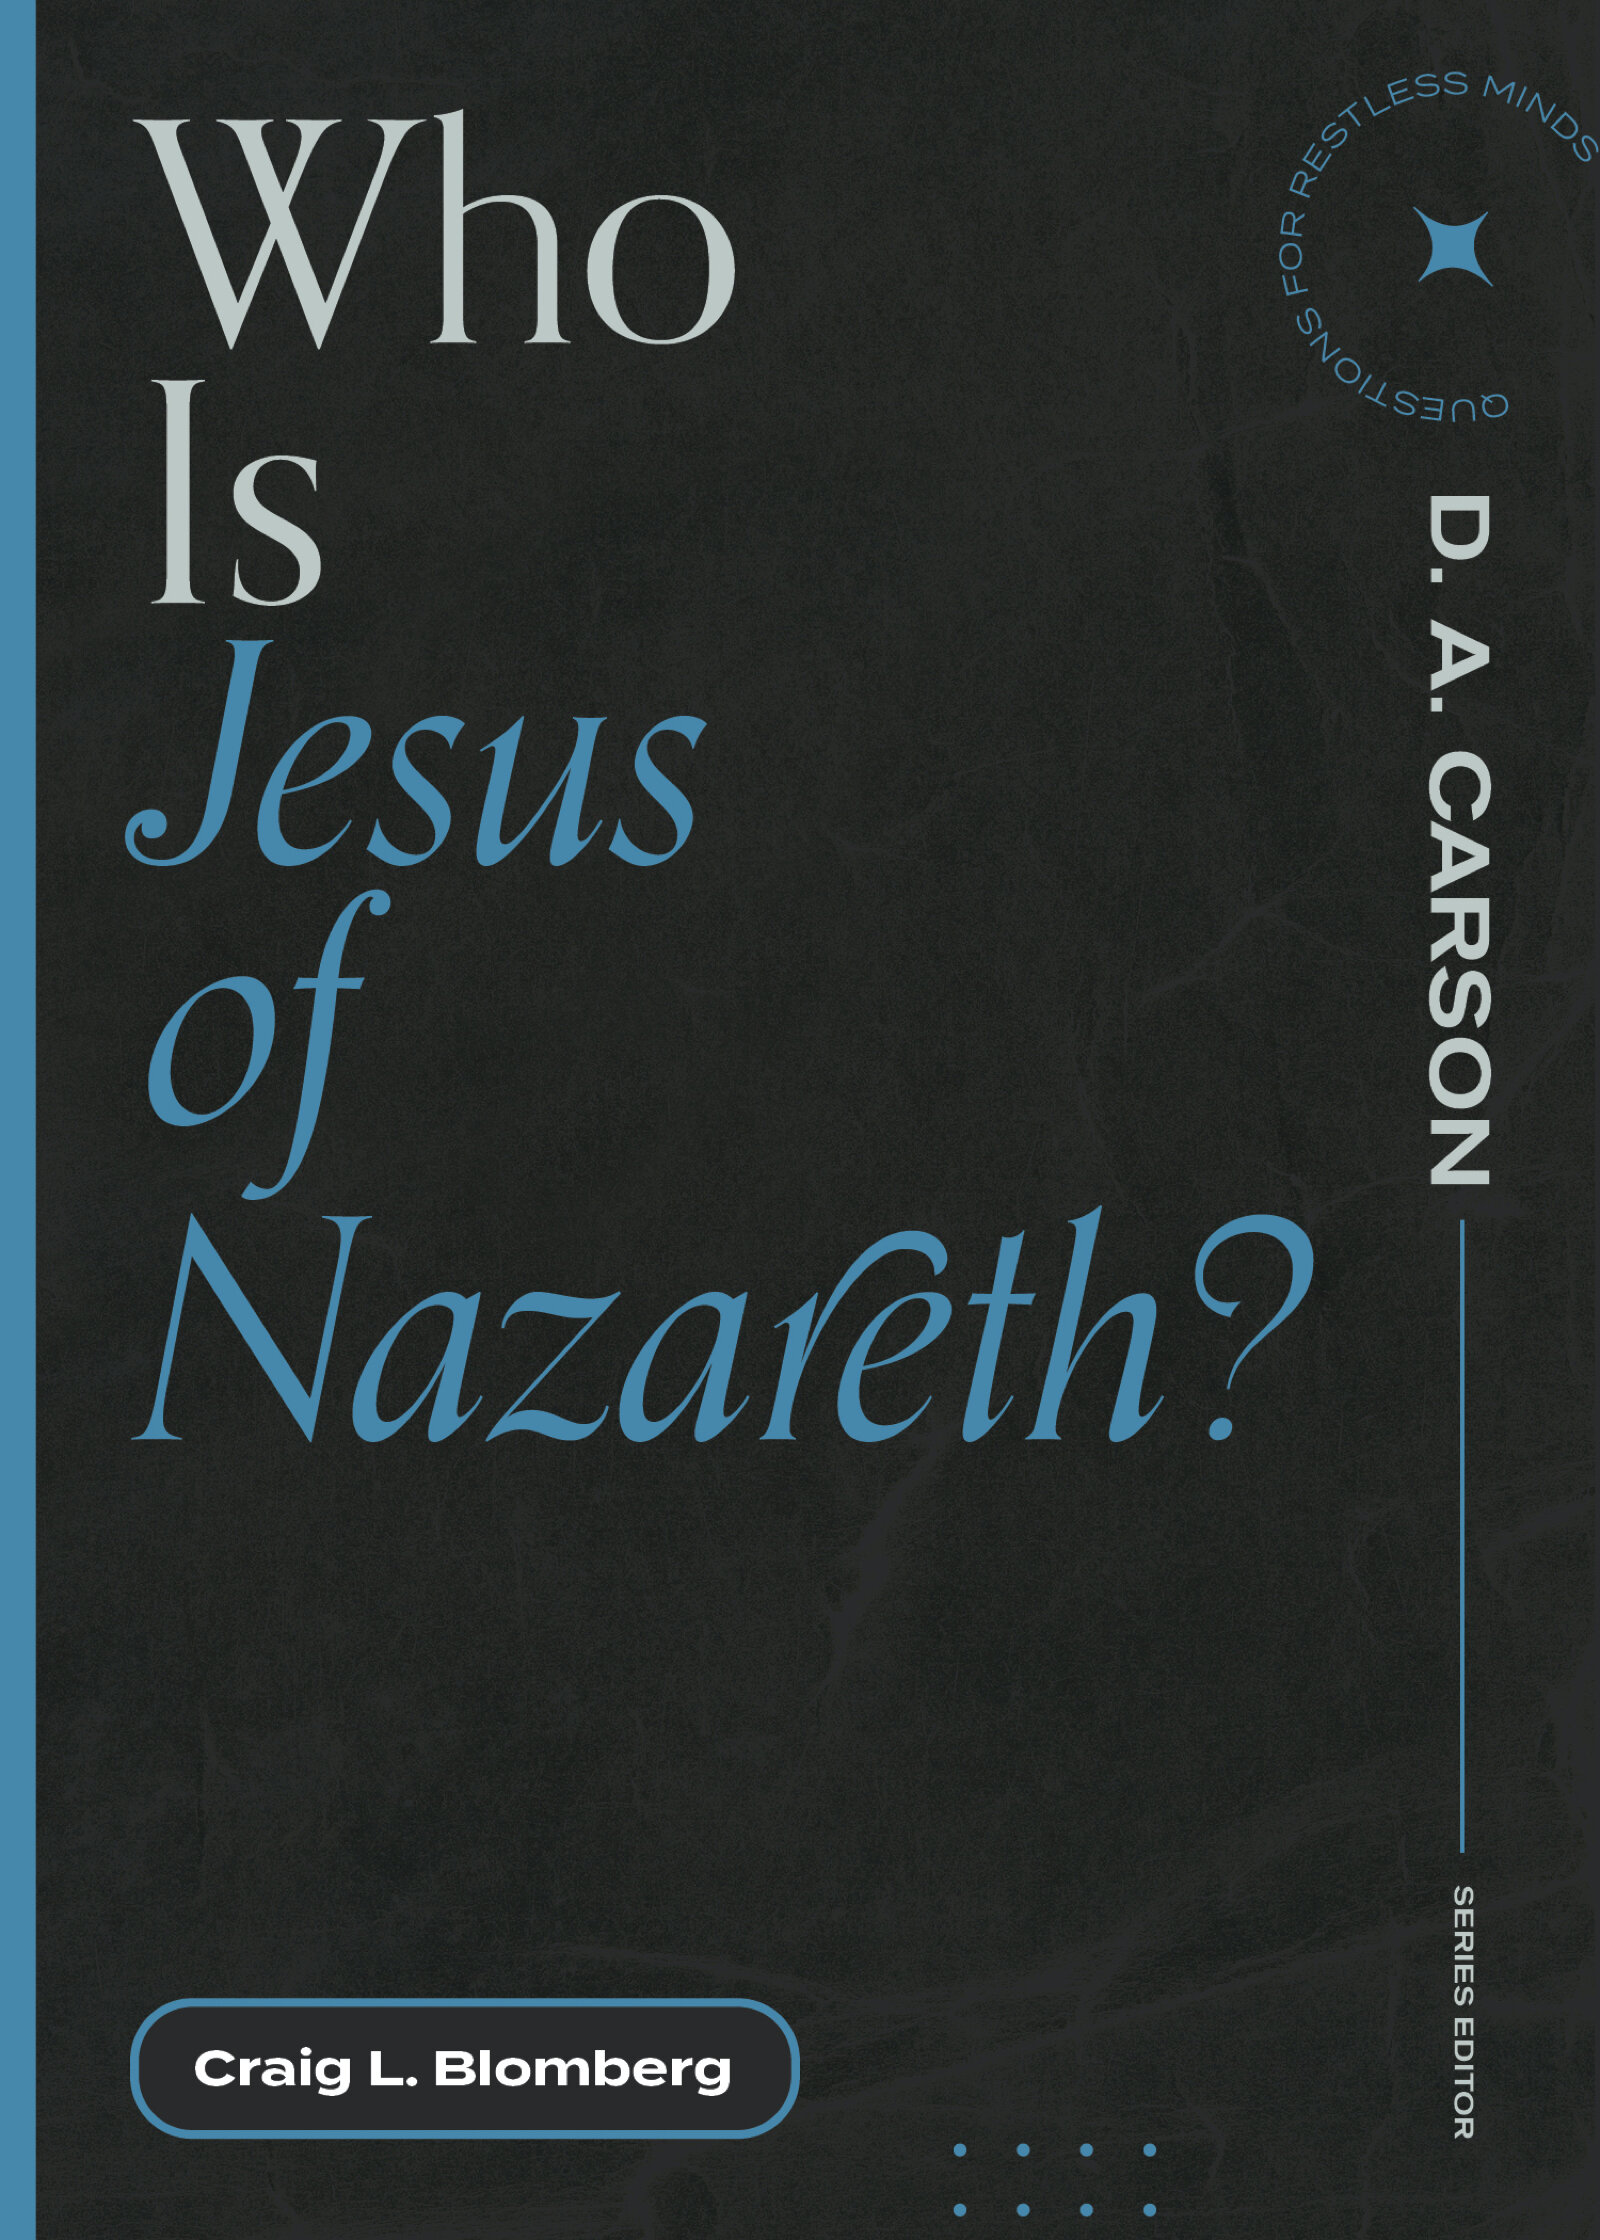 Who Is Jesus of Nazareth?